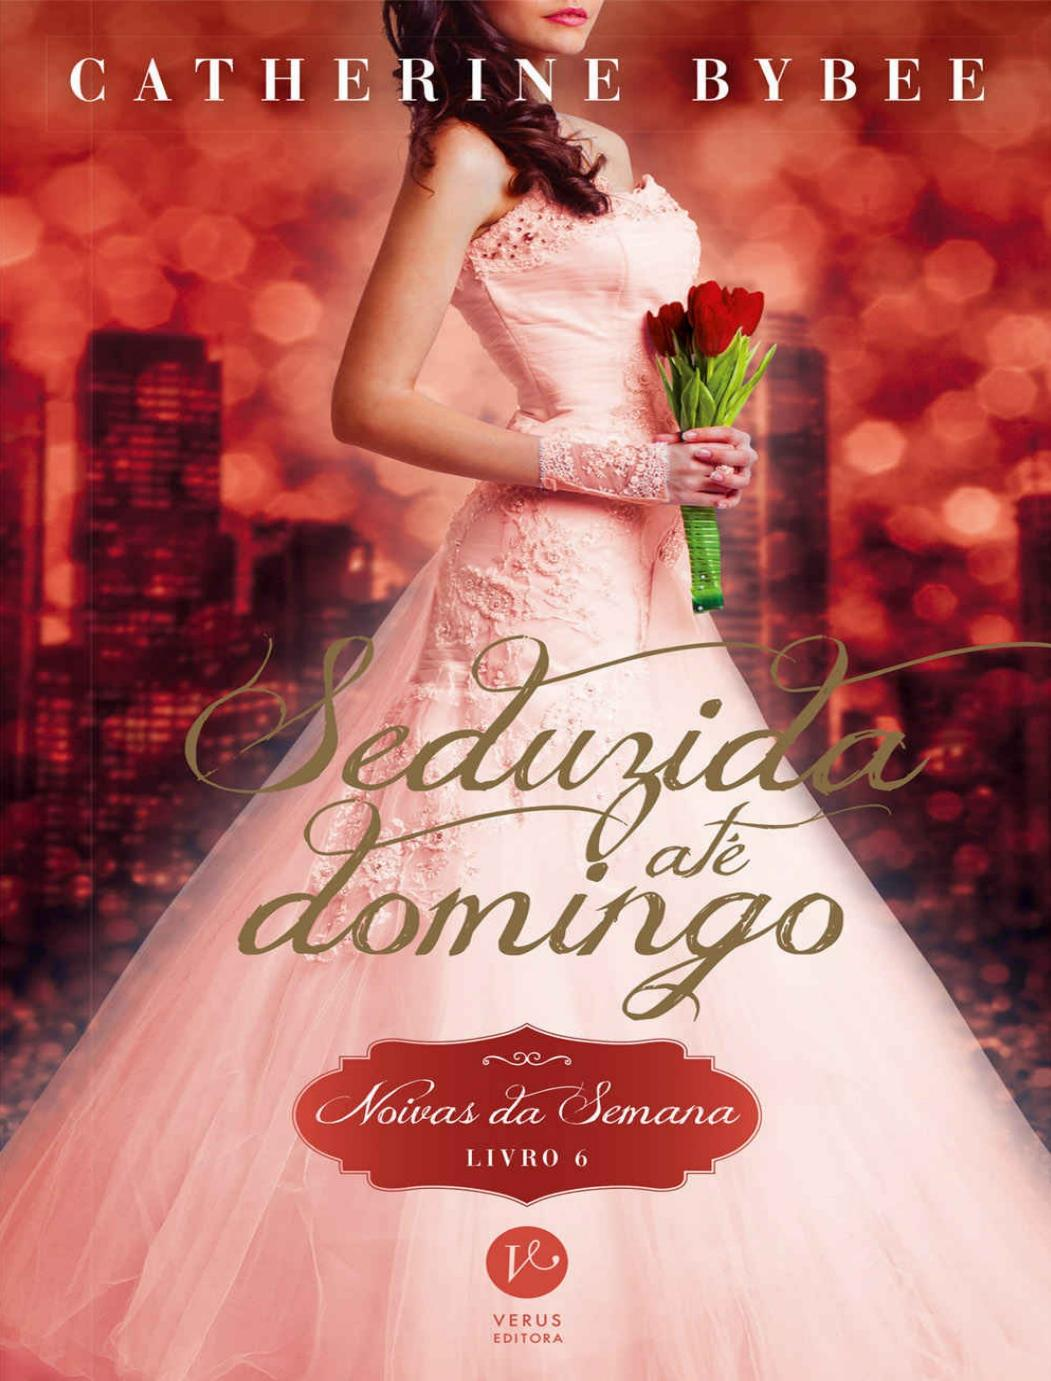 1bf6ac57c Seduzida até domingo (noivas da semana) - livro 6 - catherine bybee by  Jennifer Lussolli - issuu